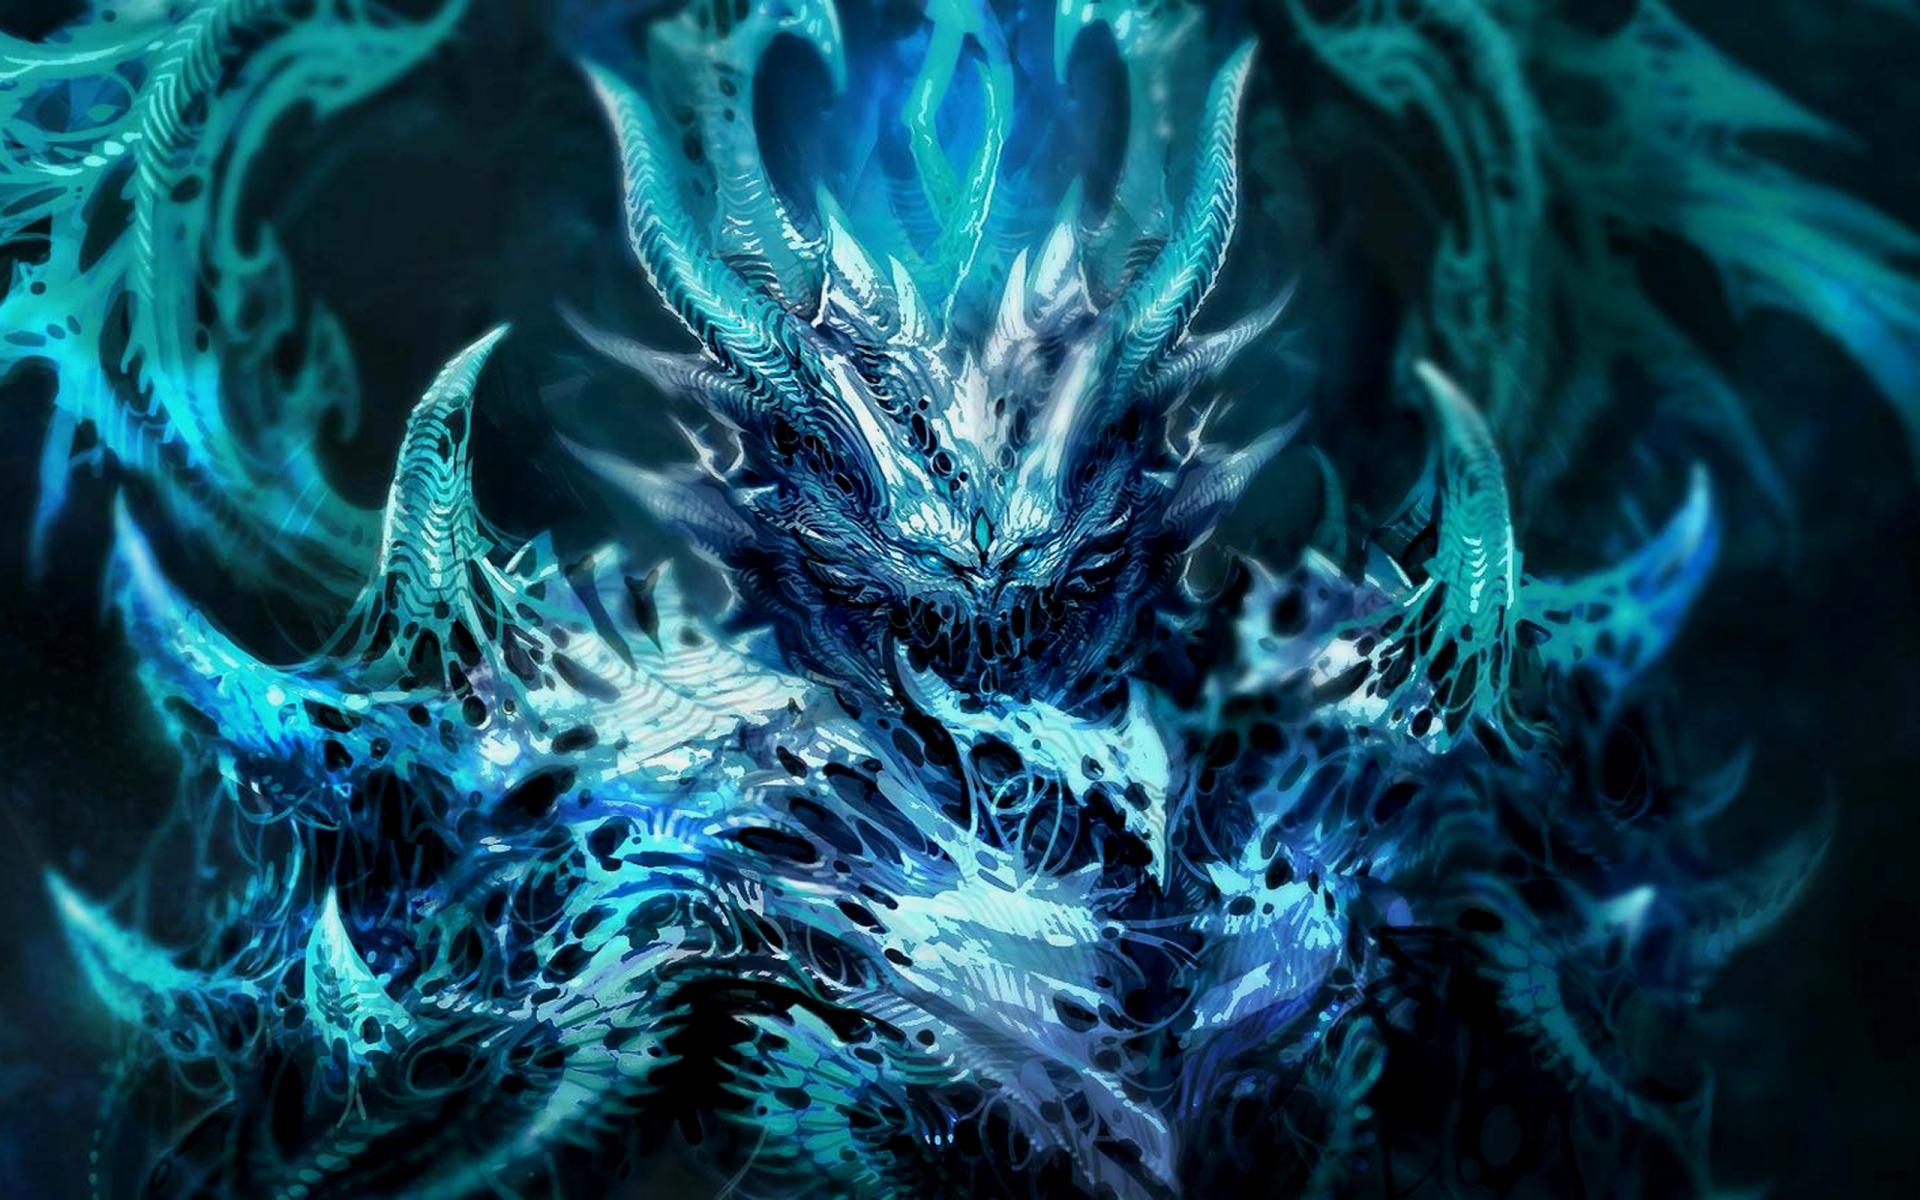 dark fantasy demon satan angel monster creature 3d magic horns blue 1920x1200